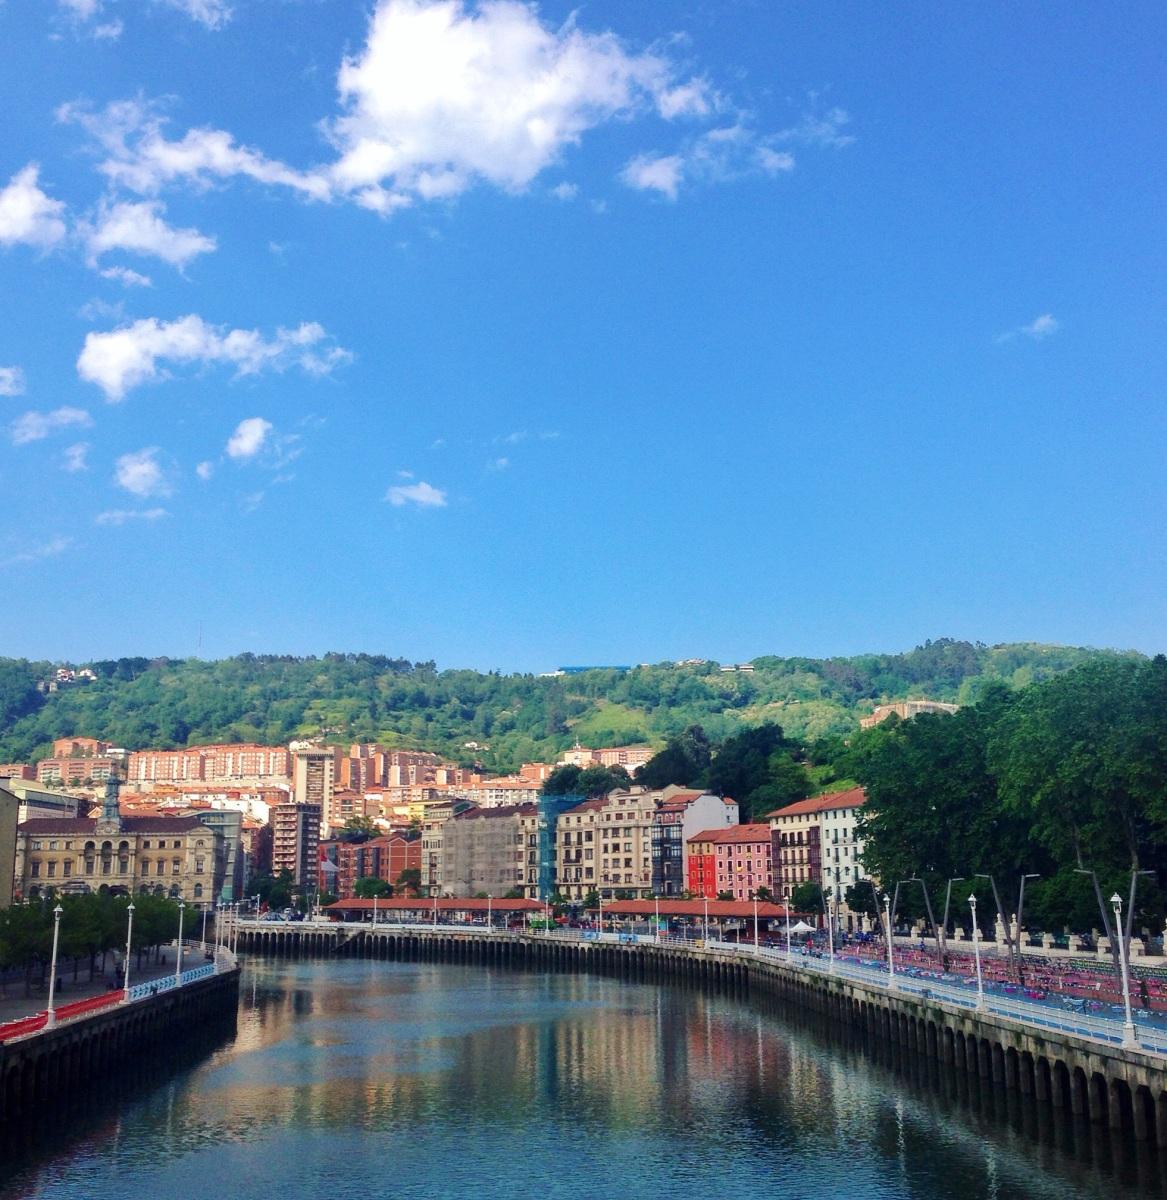 Bilbao - Bask bölgesi (I)